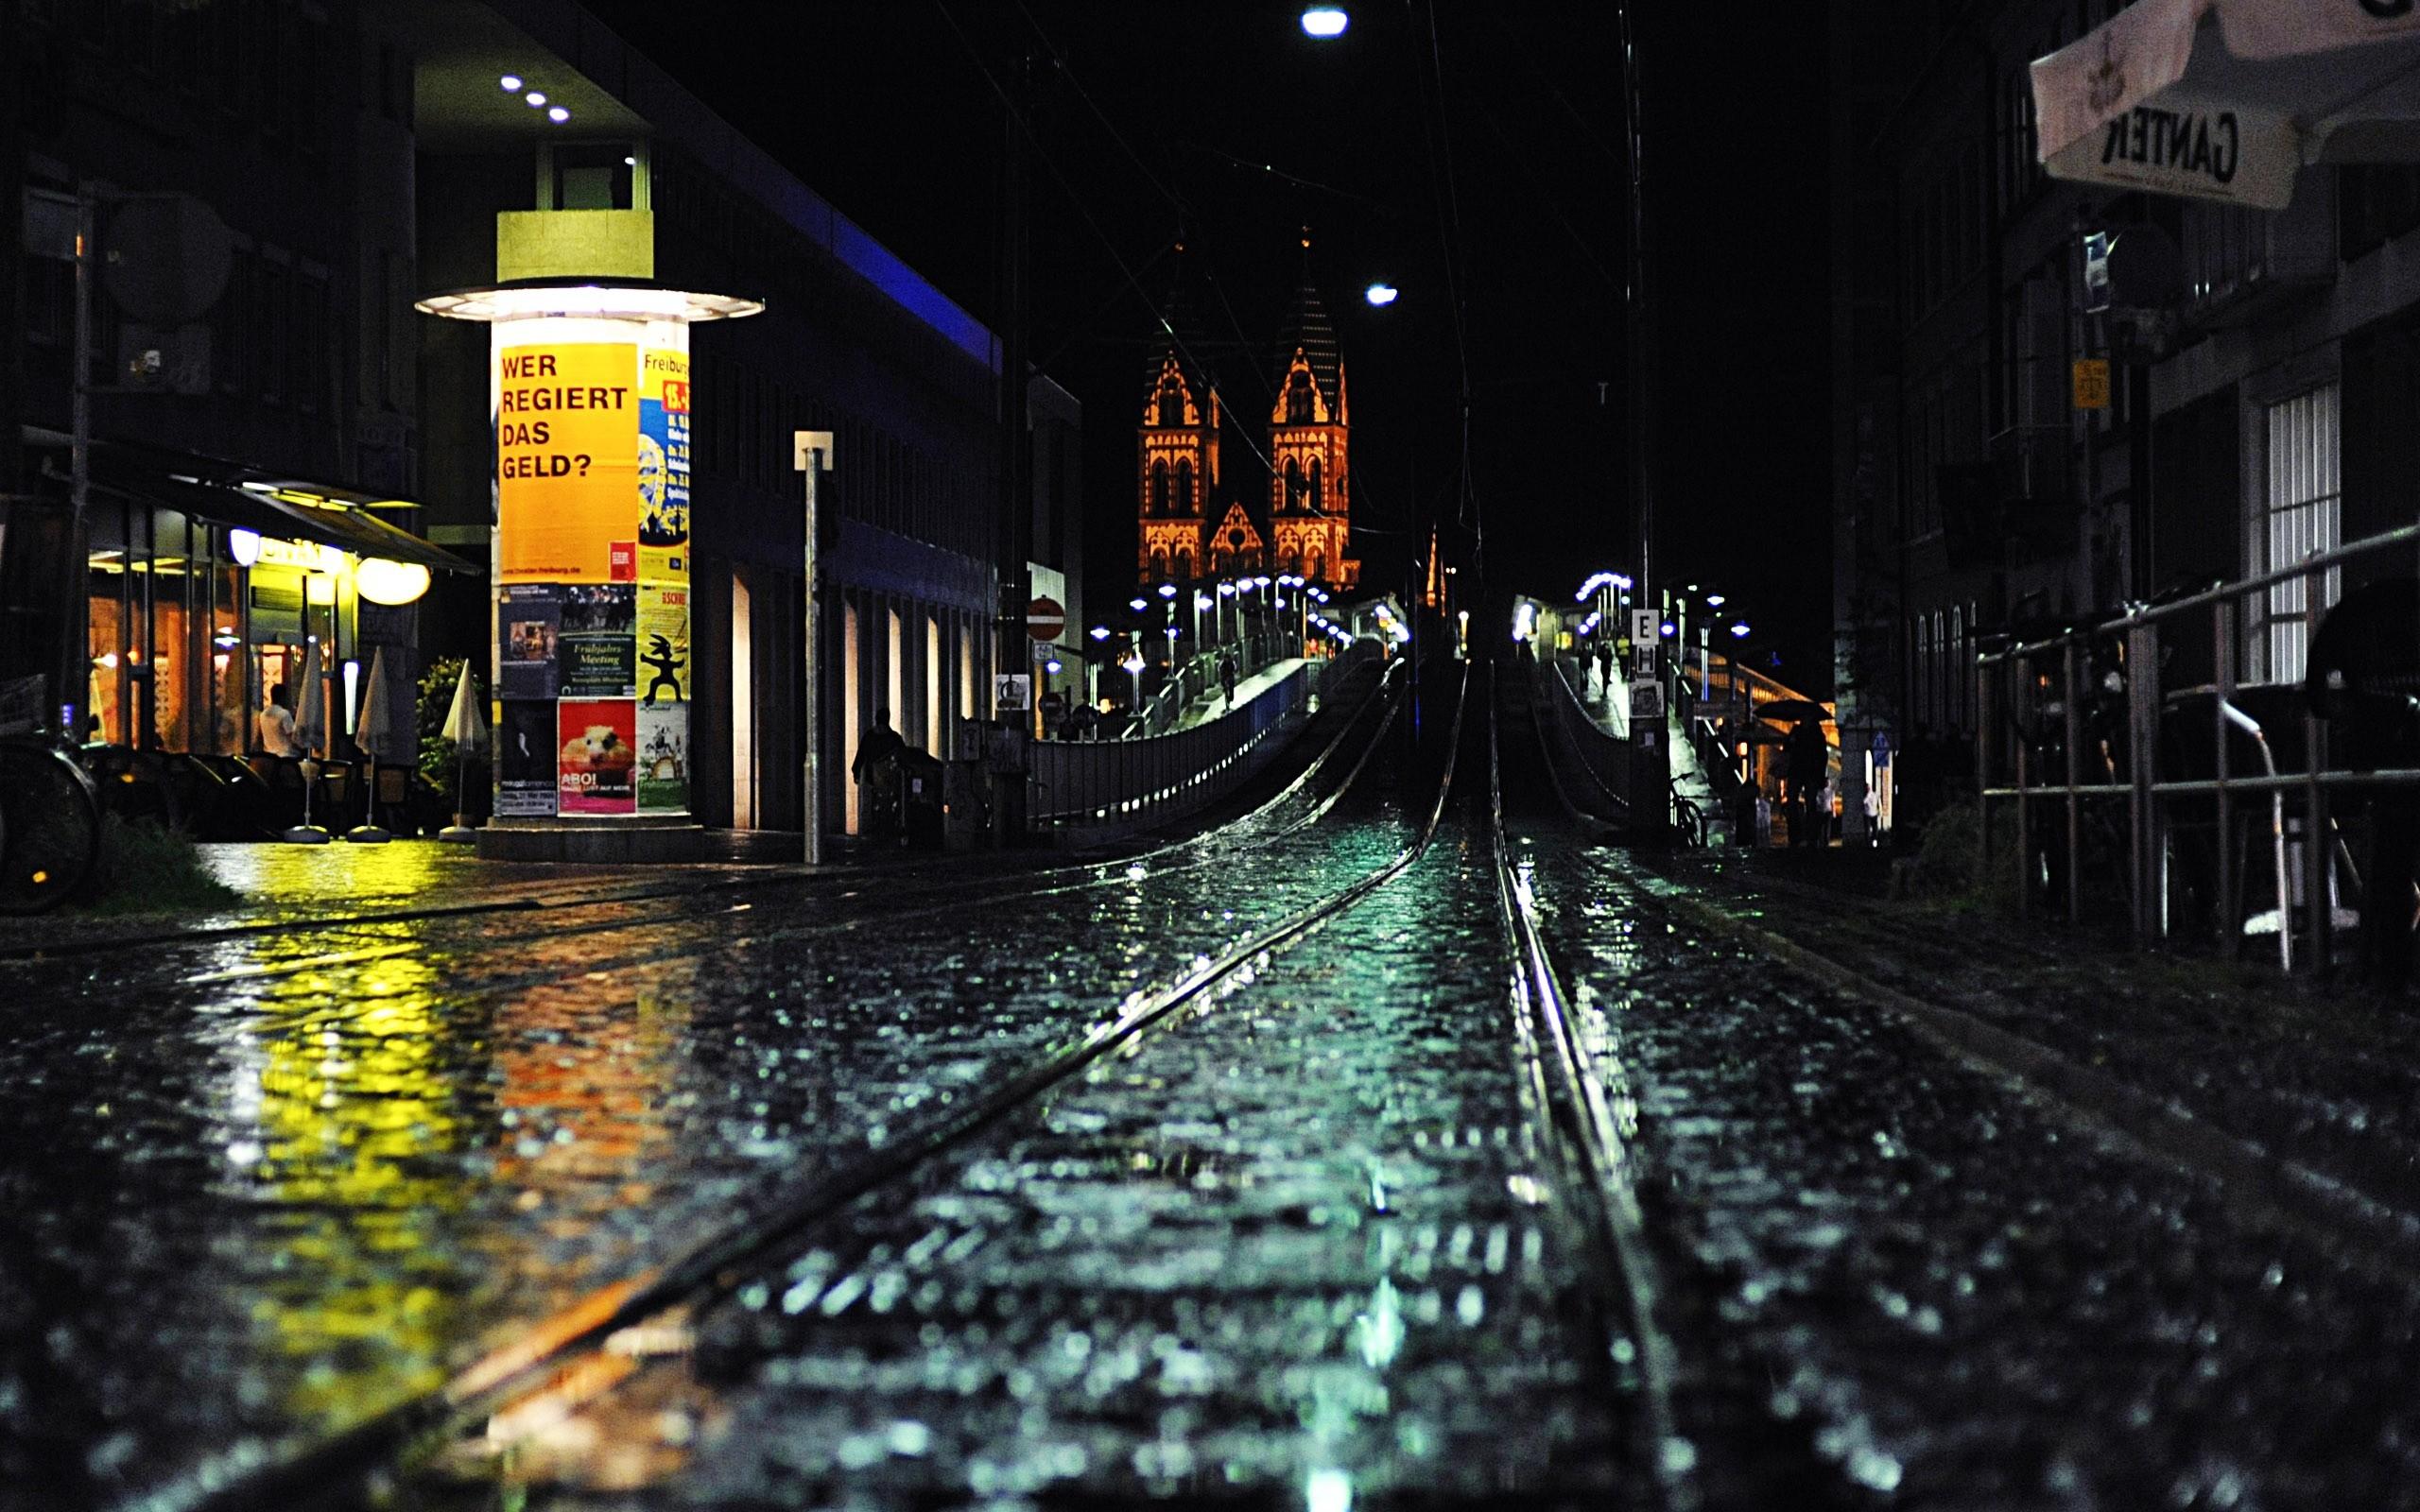 Night Rain In The City Hd Wallpapers Widescreen | sun | Pinterest  | Hd wallpaper, Wallpaper and Desktop backgrounds